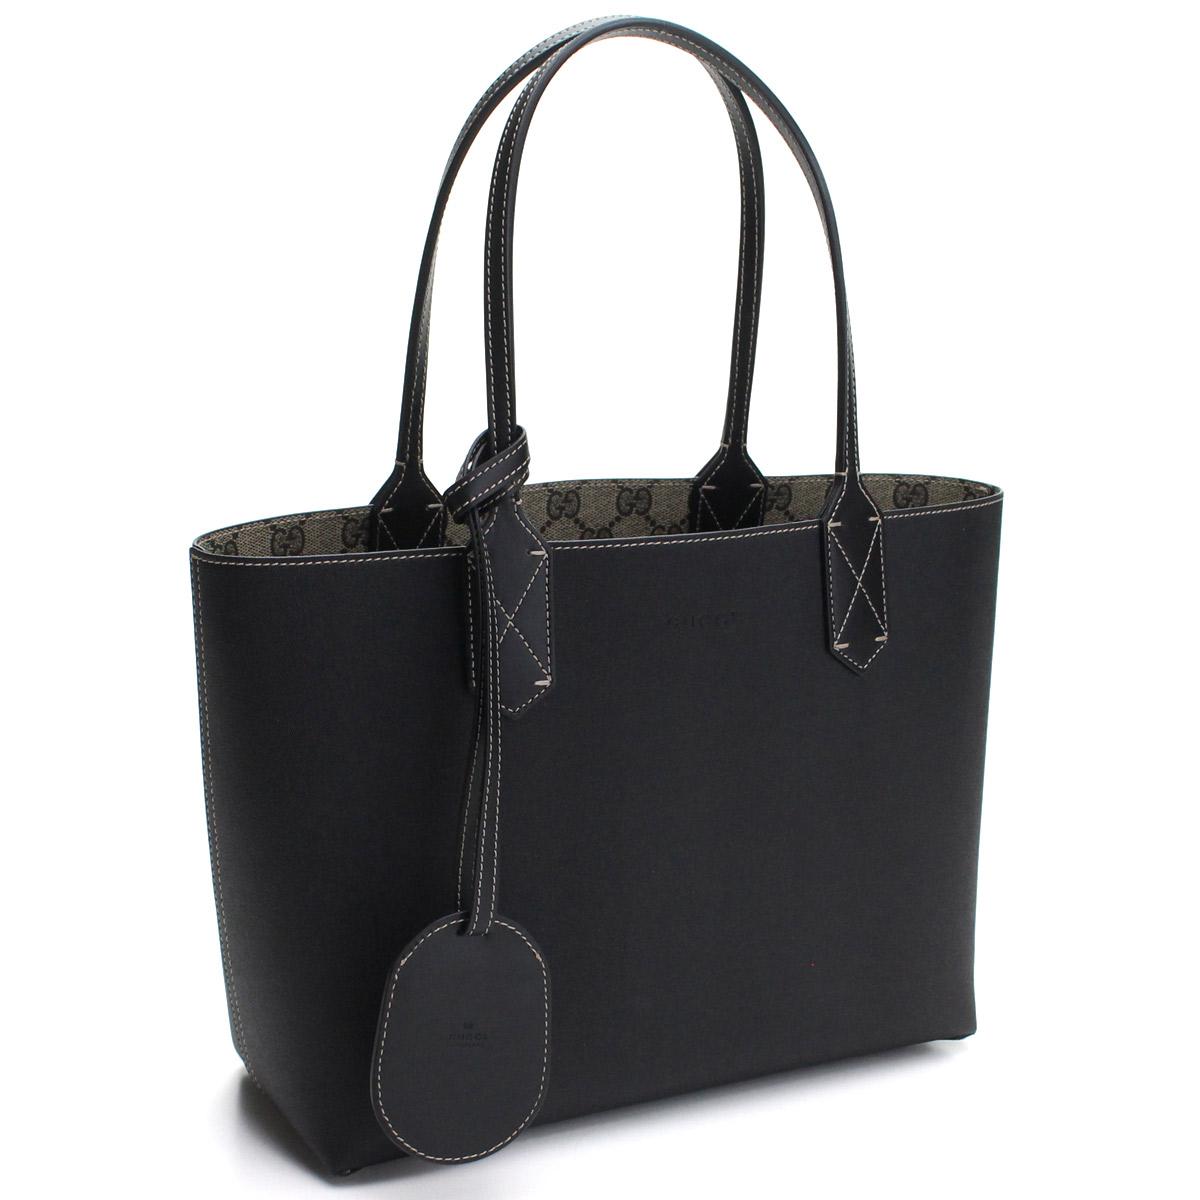 9212058697172f Bighit The total brand wholesale: Gucci GUCCI reversible tote bag 372613  A9810 9769 black / beige system | Rakuten Global Market